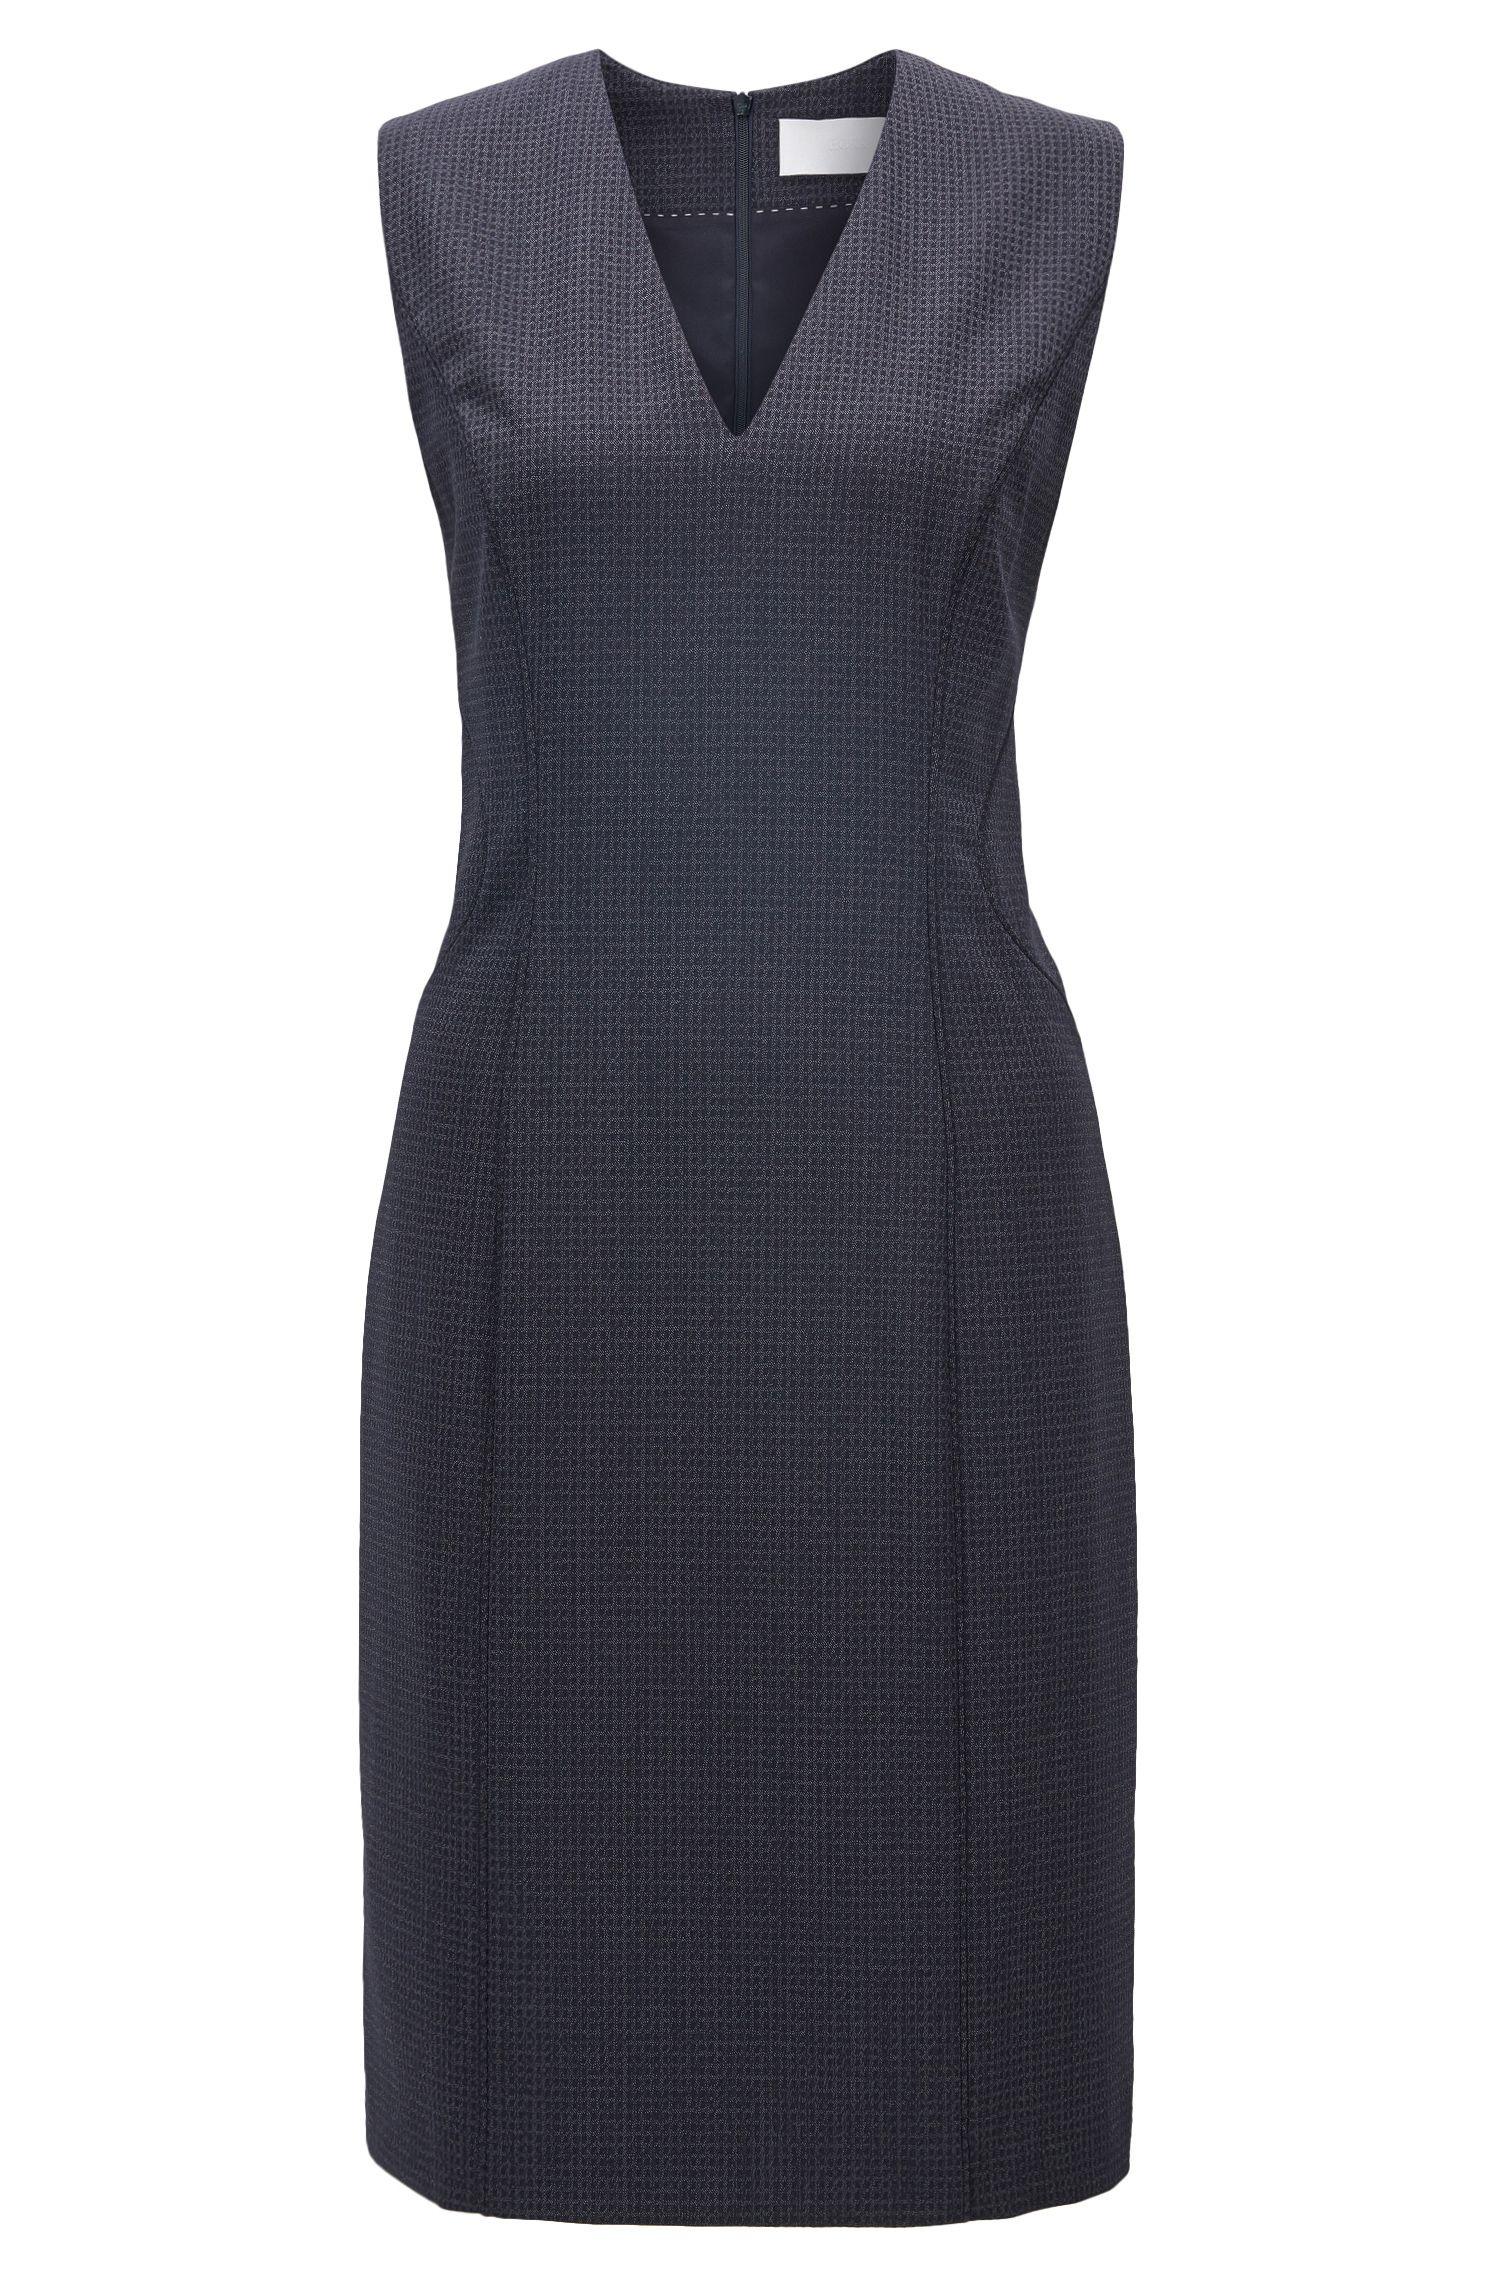 'Dukani' | Square-Print Stretch Virgin Wool-Silk Sheath Dress